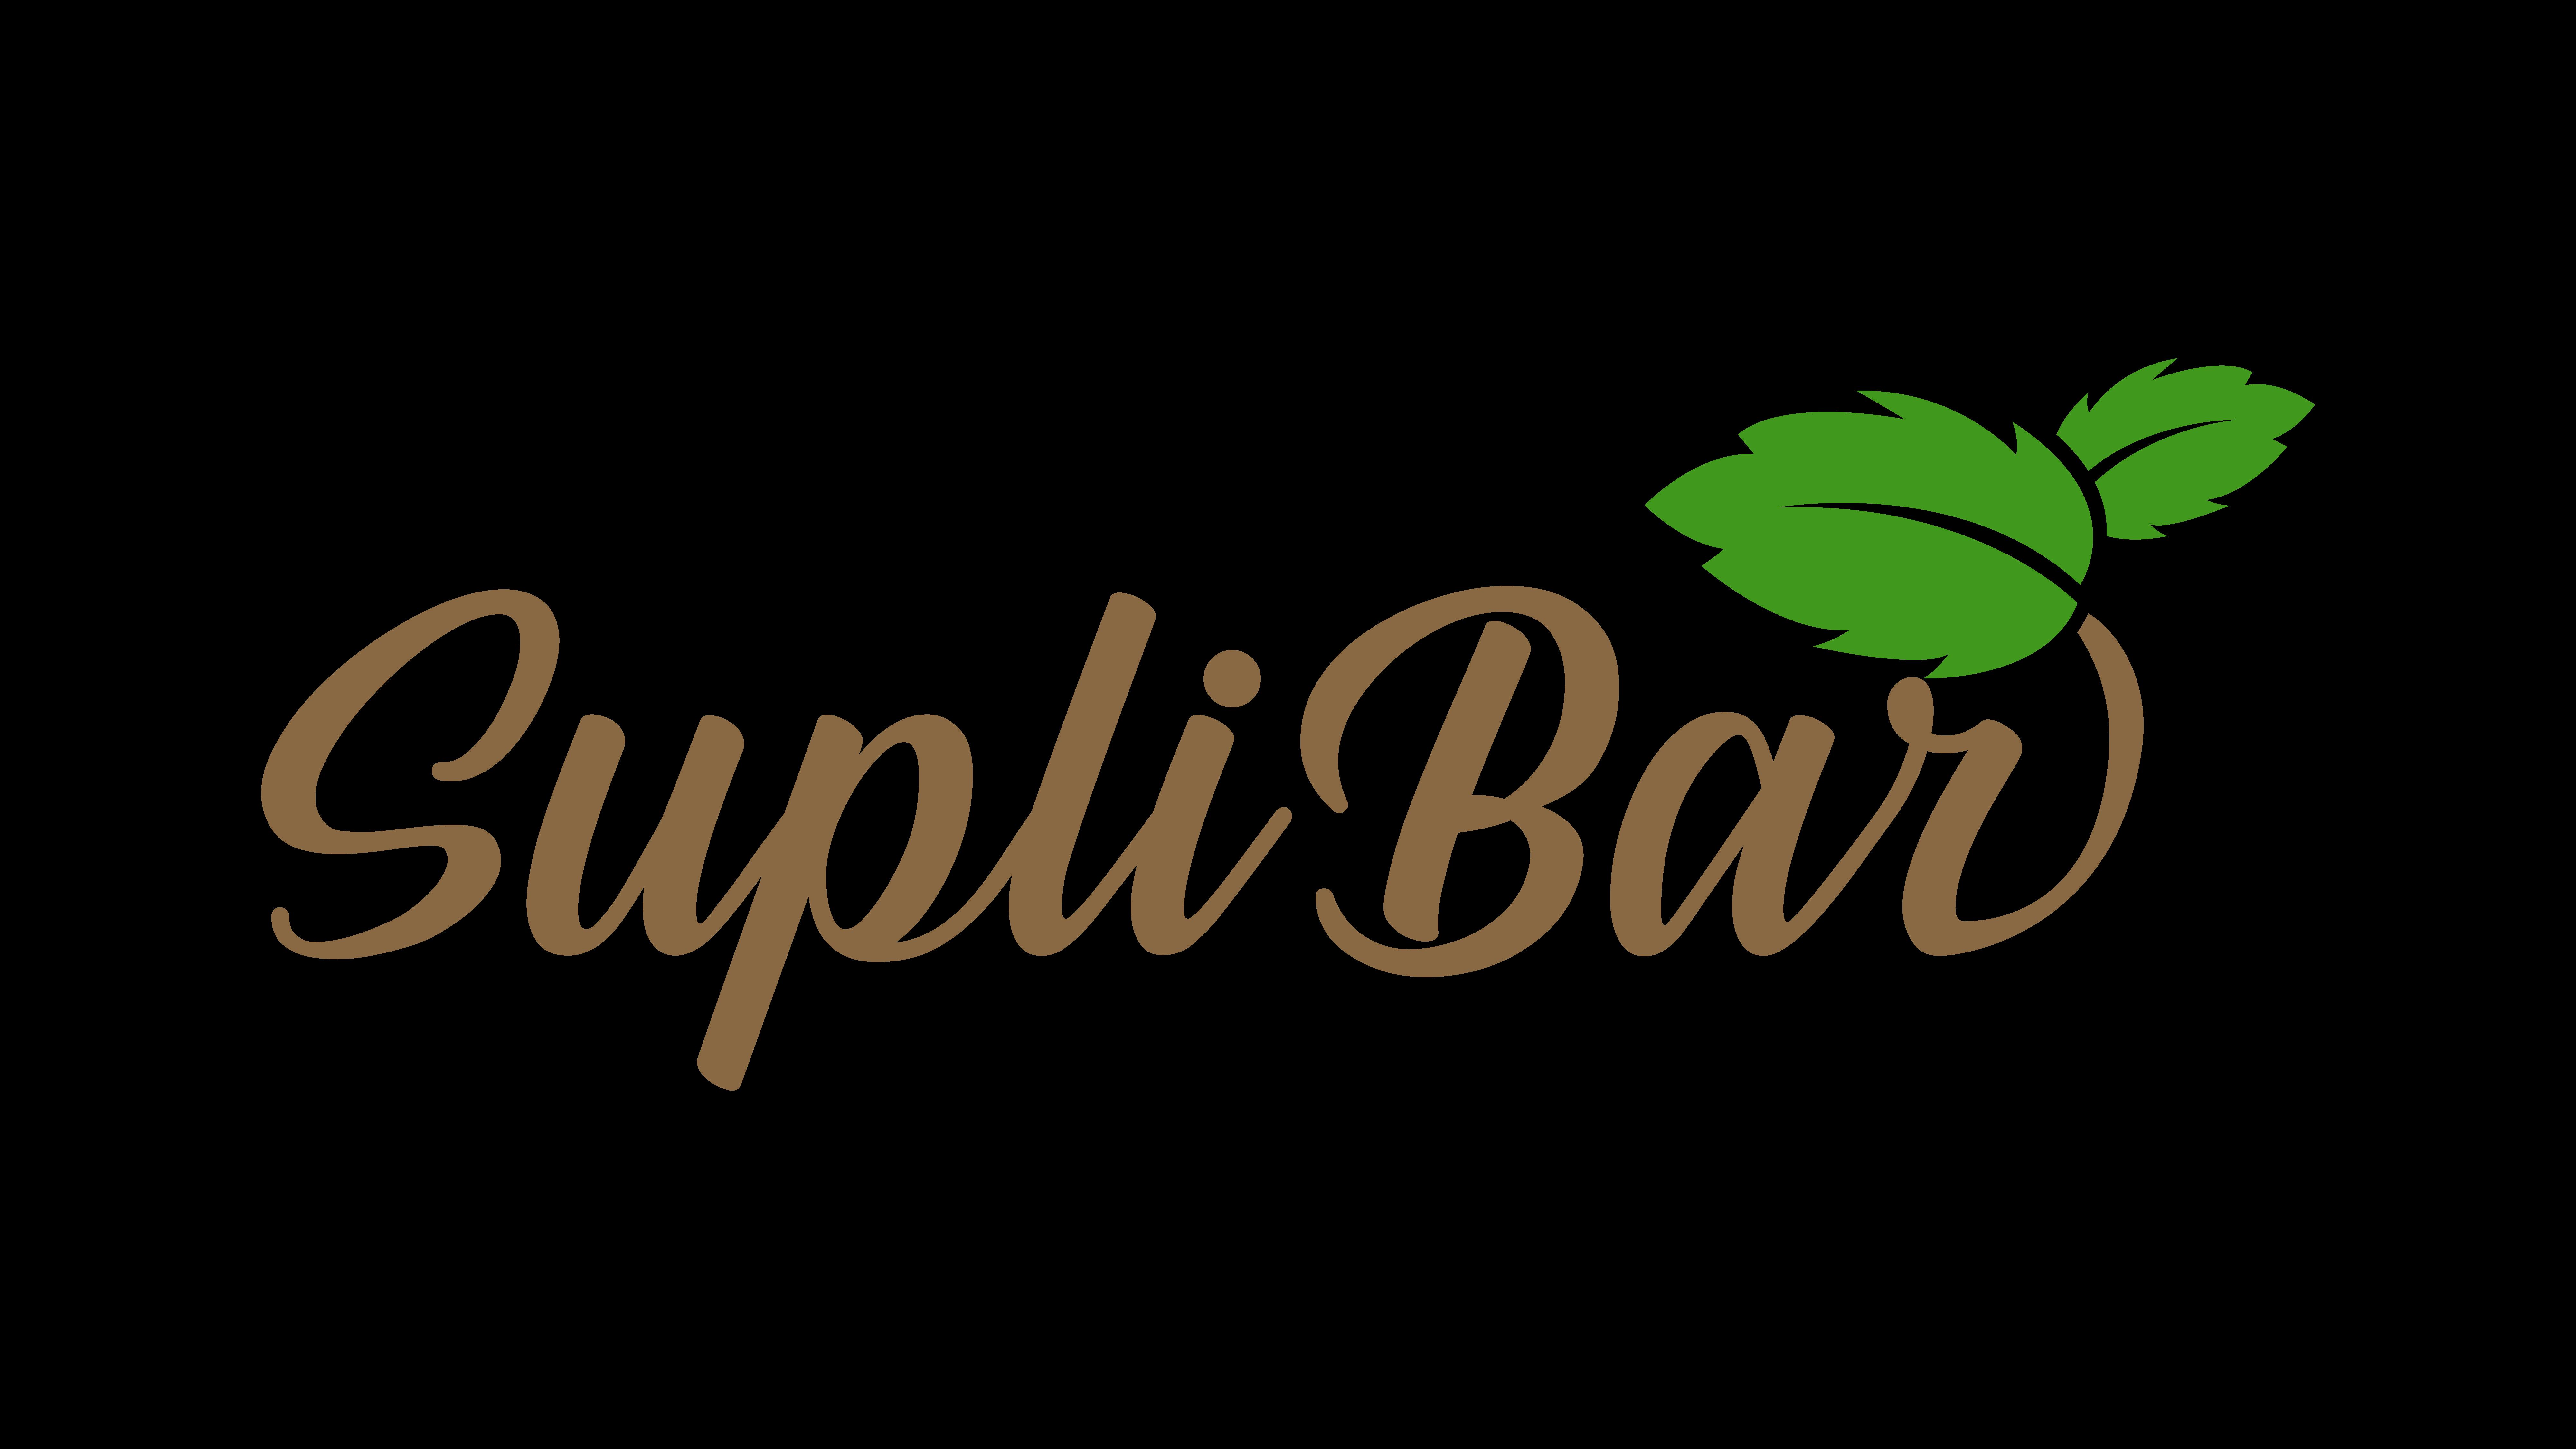 suplibar logo